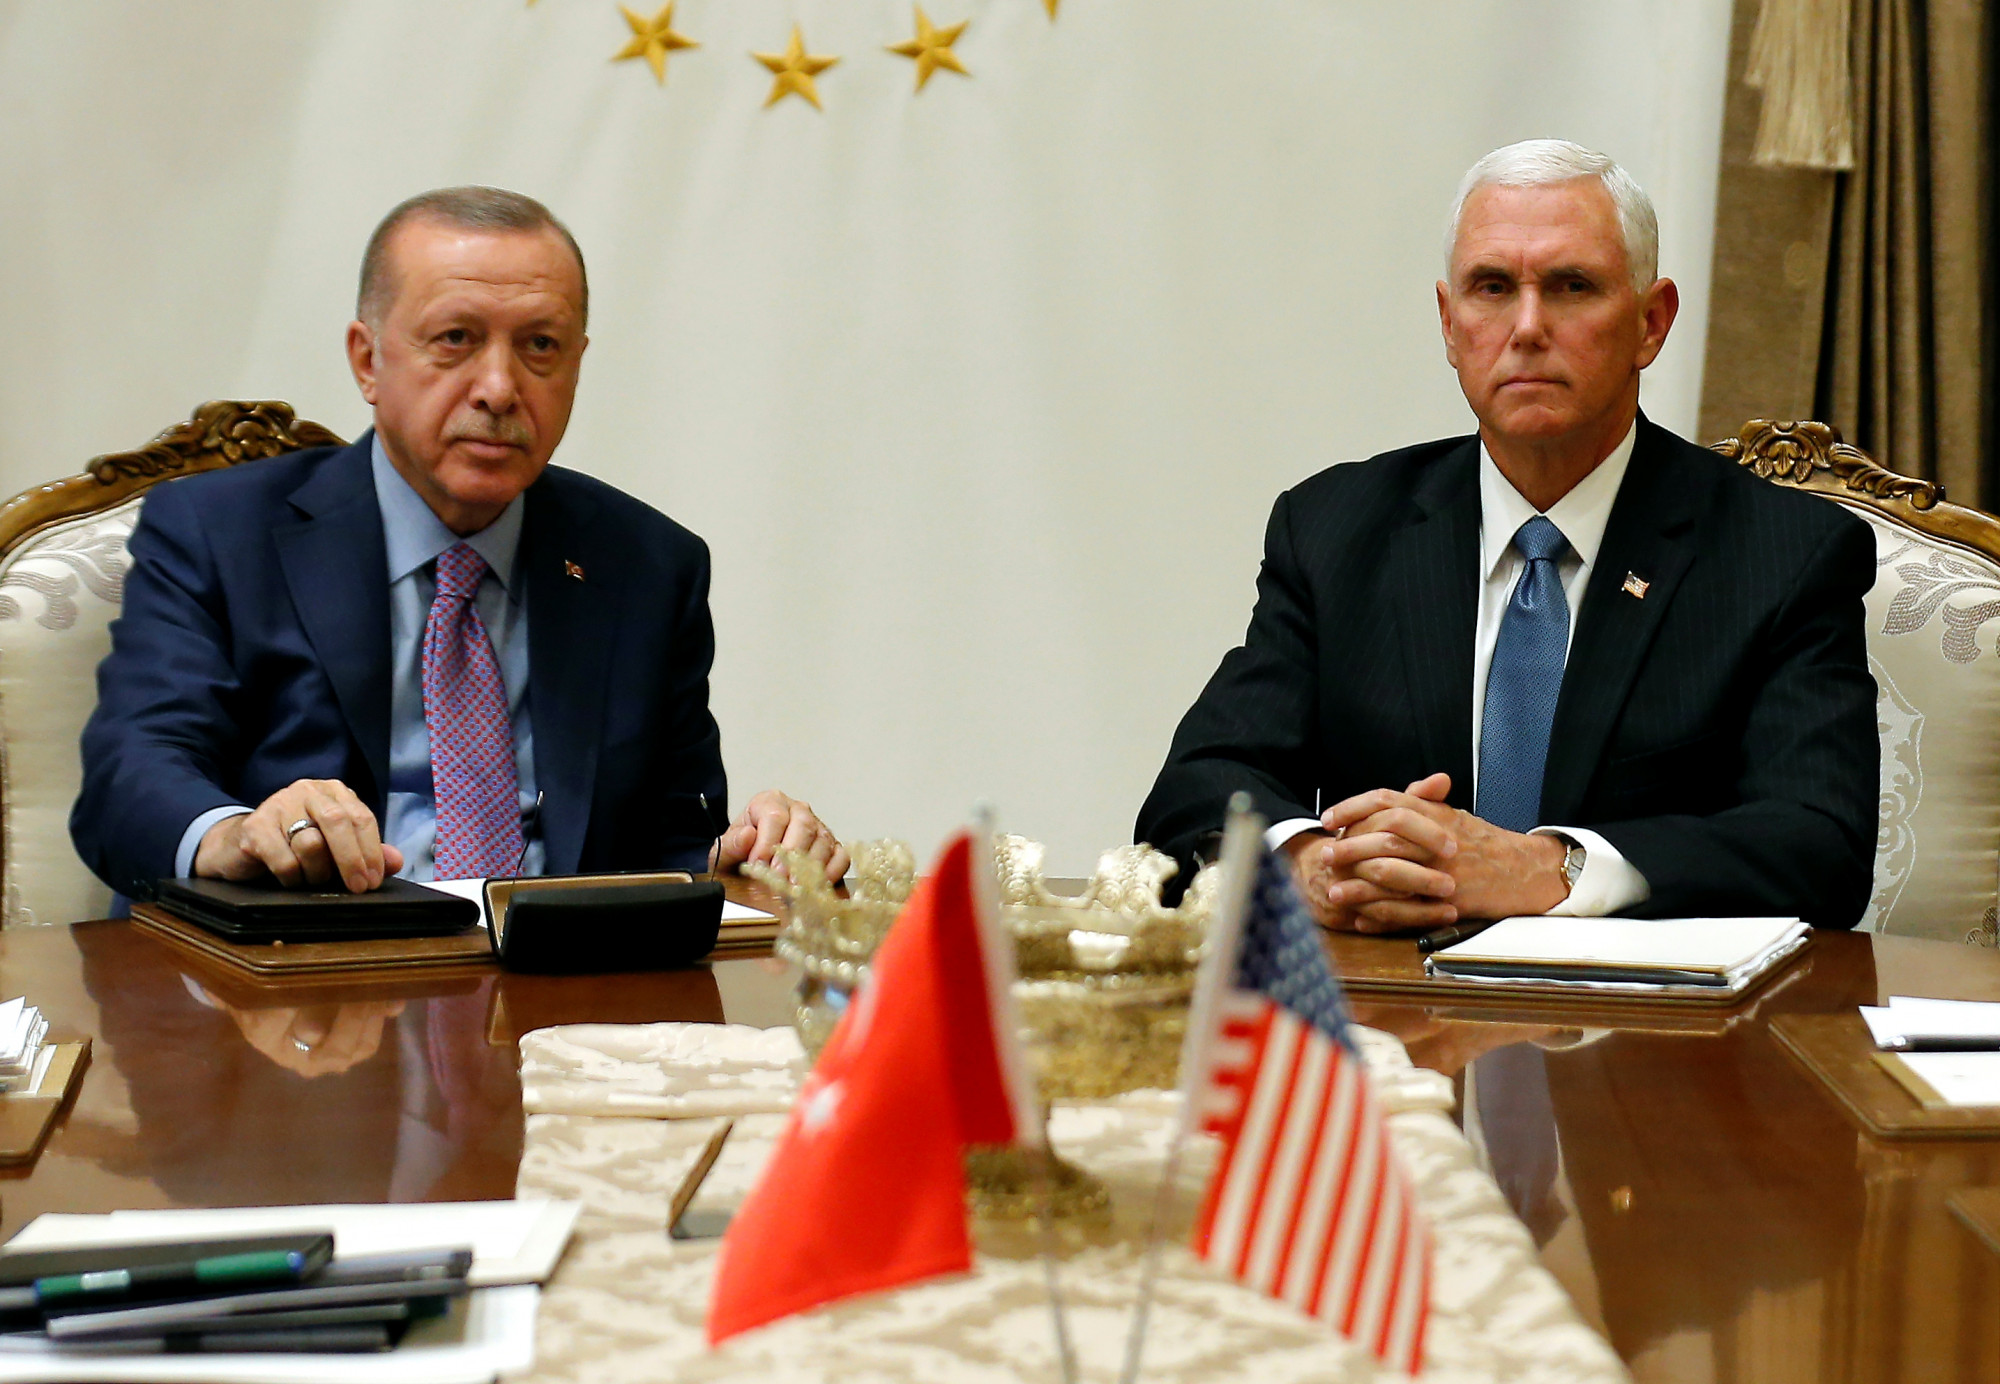 Pence Meets Erdogan to Urge Halt to Turkey's Syria Offensive